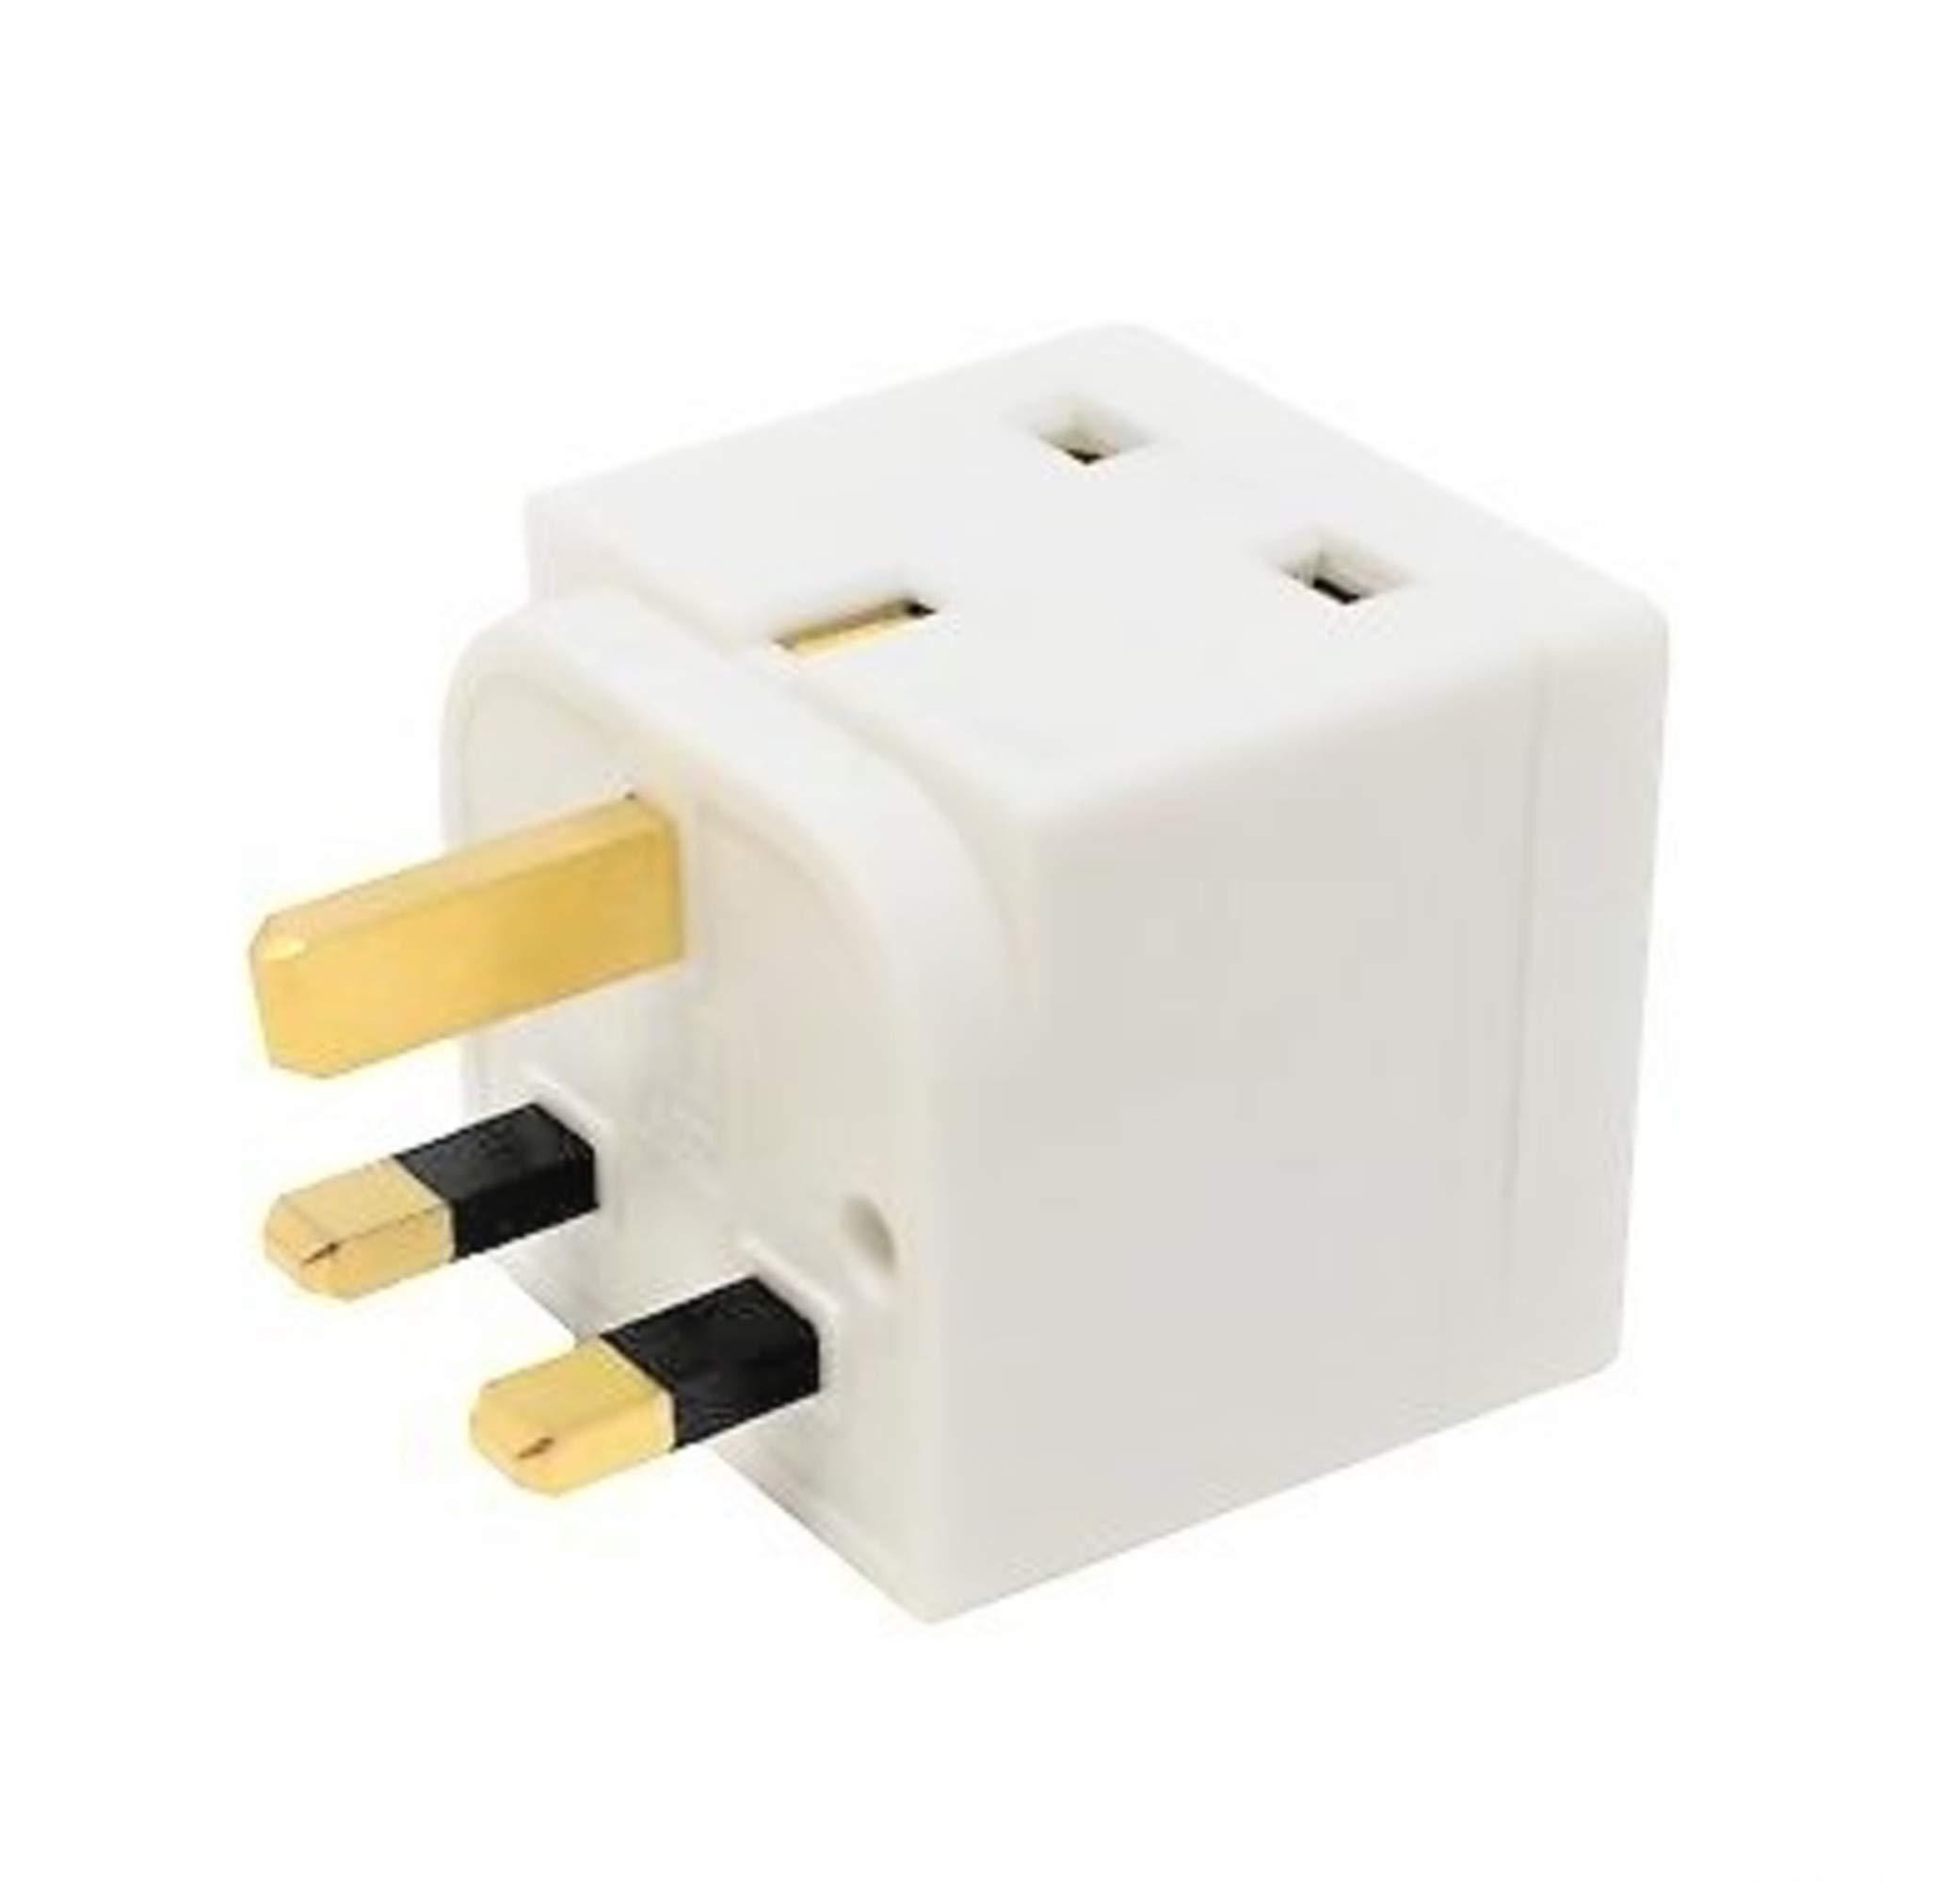 HomeBerg 2 Way Double Plug Adaptor - Multi Plugs Extension Sockets Adapter - UK 3 Pin Socket Extensions 250V 13 Amp - Power Extender Multiplug Block for Kitchen, Office, PC, TV, Indoor Lighting